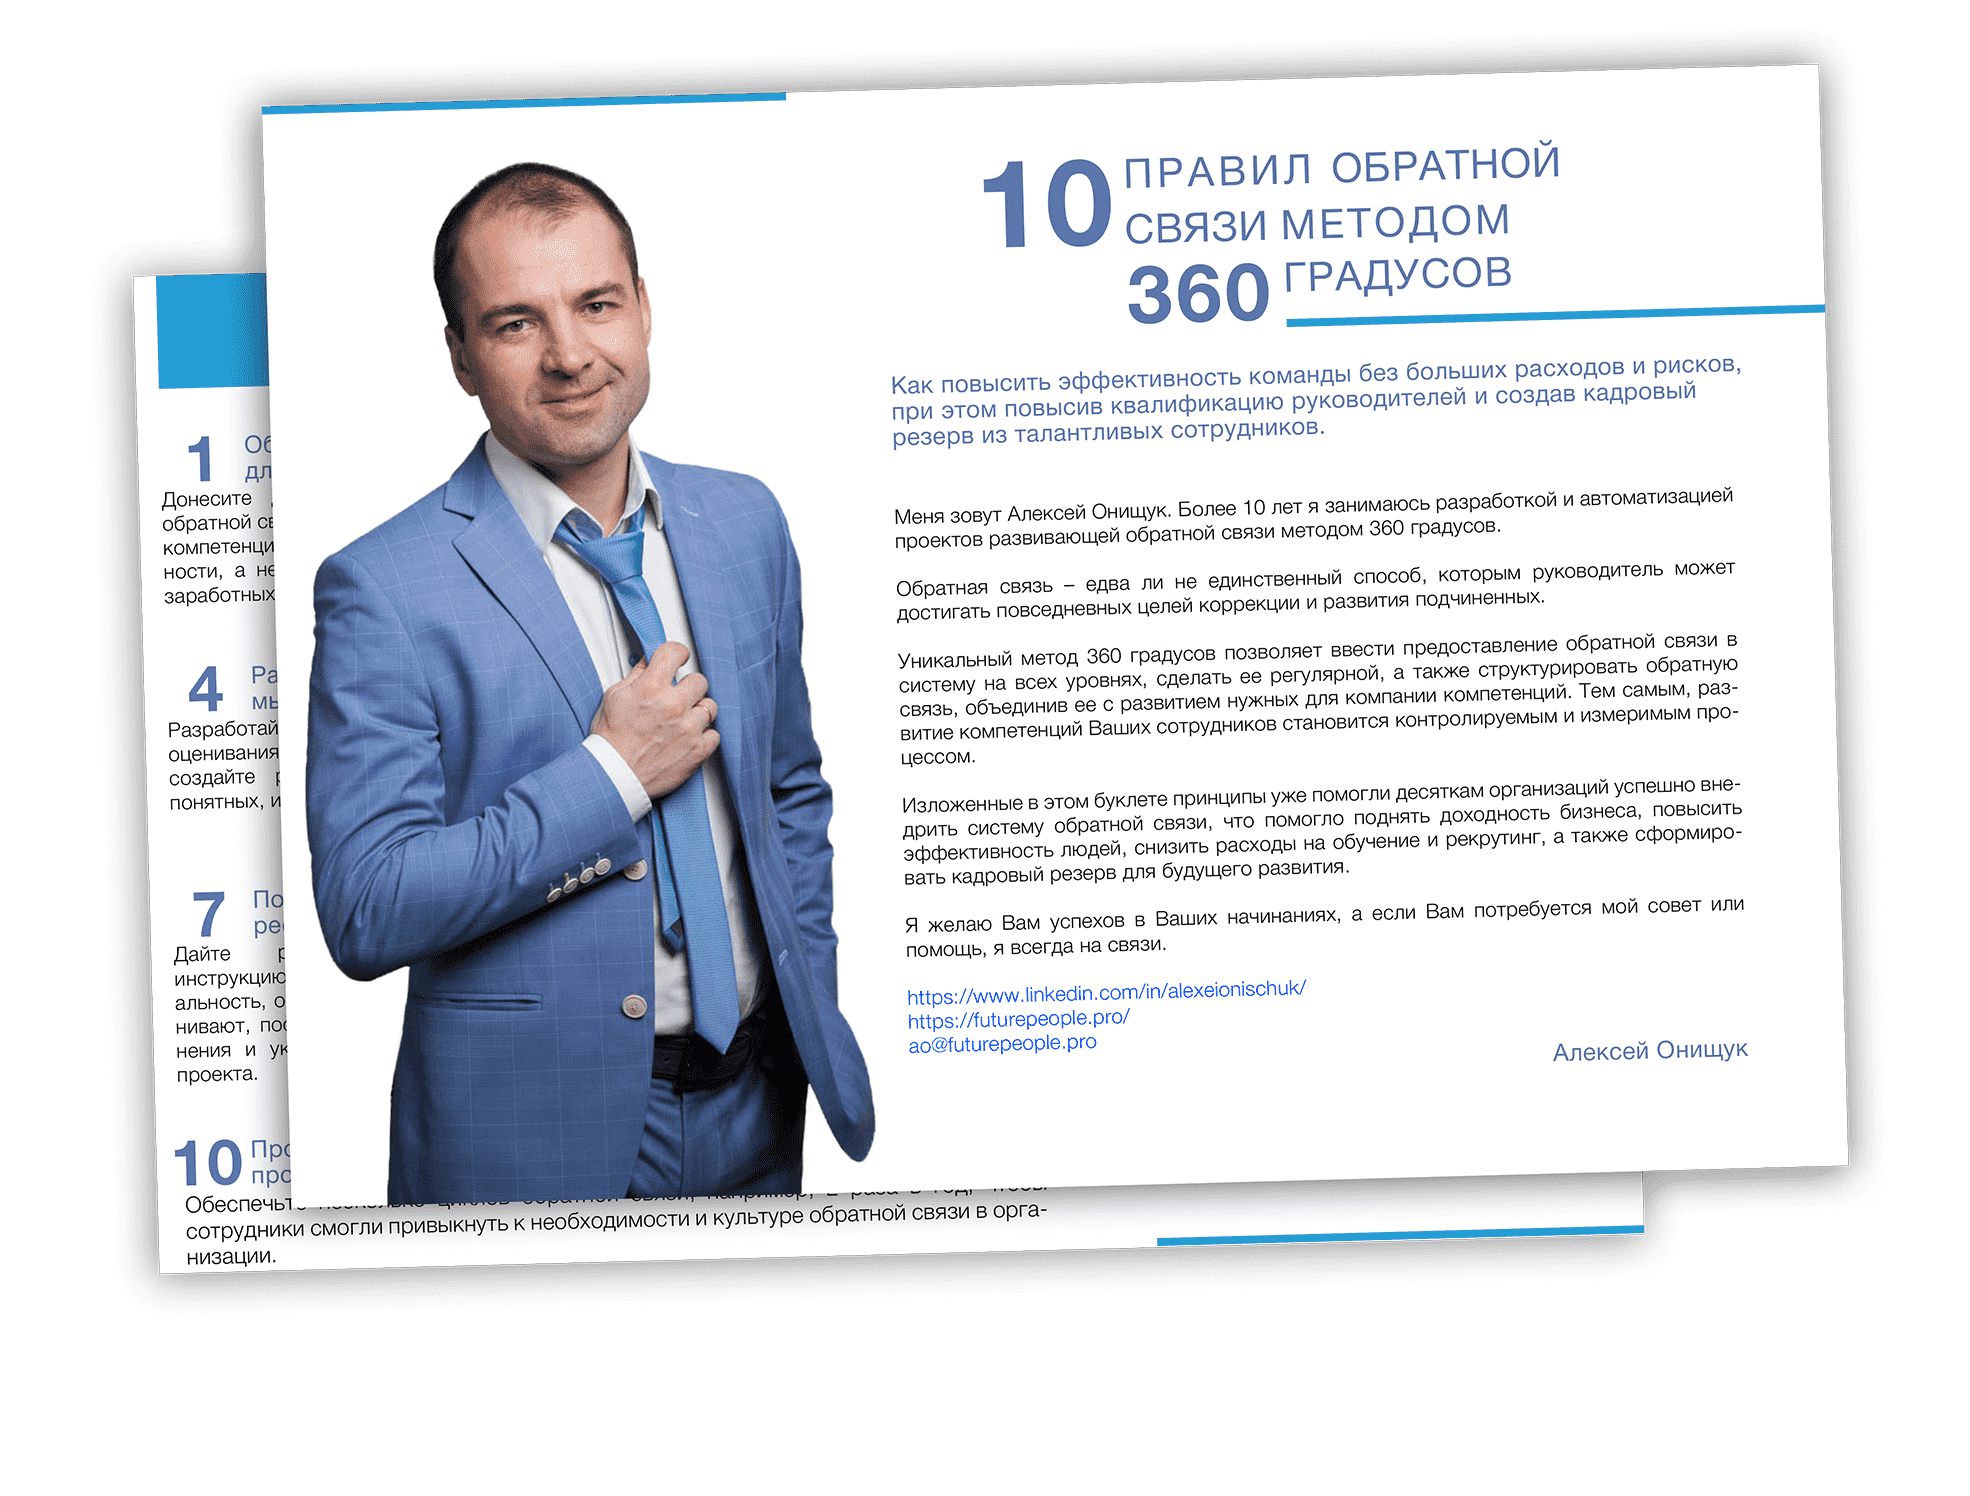 10 правил оценки 360